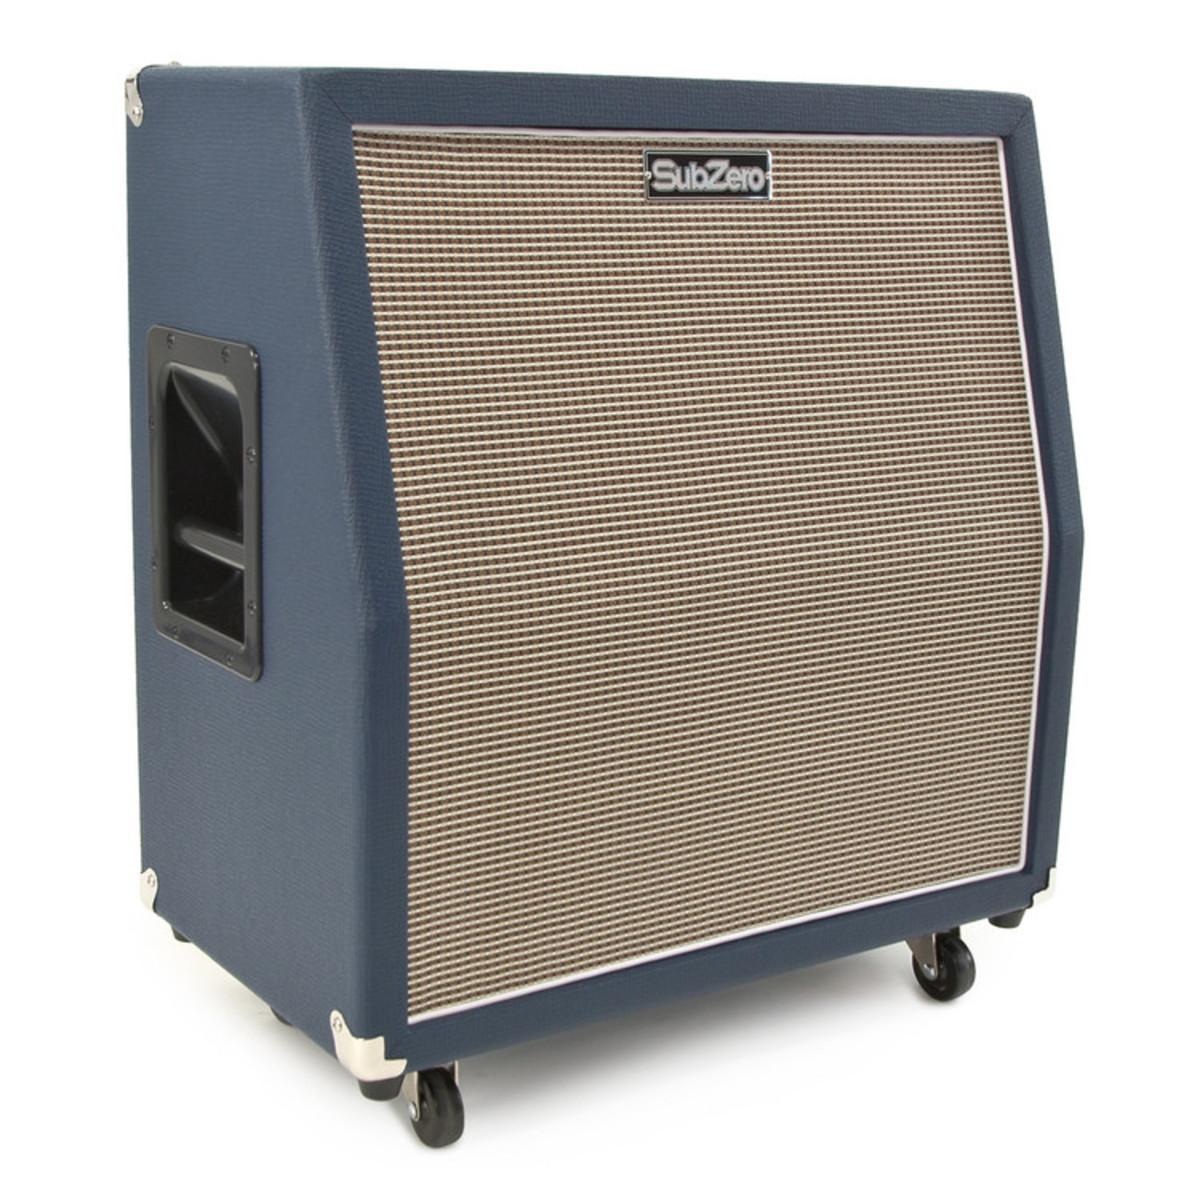 subzero g410 4 x 10 celestion speaker cabinet b stock at gear4music. Black Bedroom Furniture Sets. Home Design Ideas